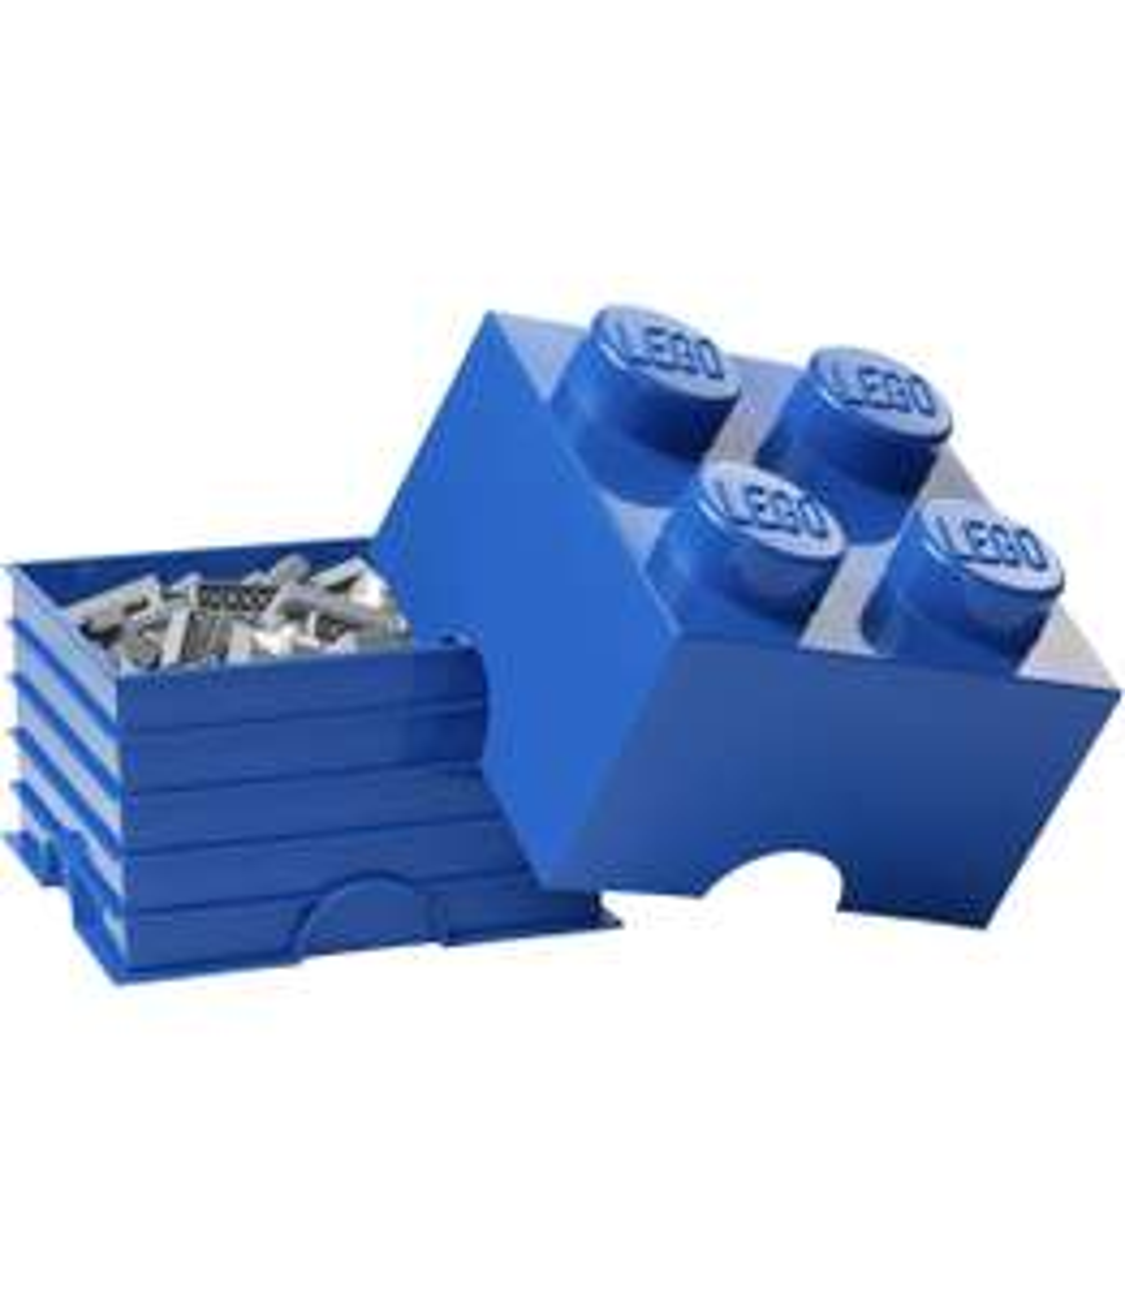 LEGO Brick 4 Knobs Stackable Storage Box, Blue, 5.7 Litre £8.99 Prime / +£4.49 non Prime @ Amazon